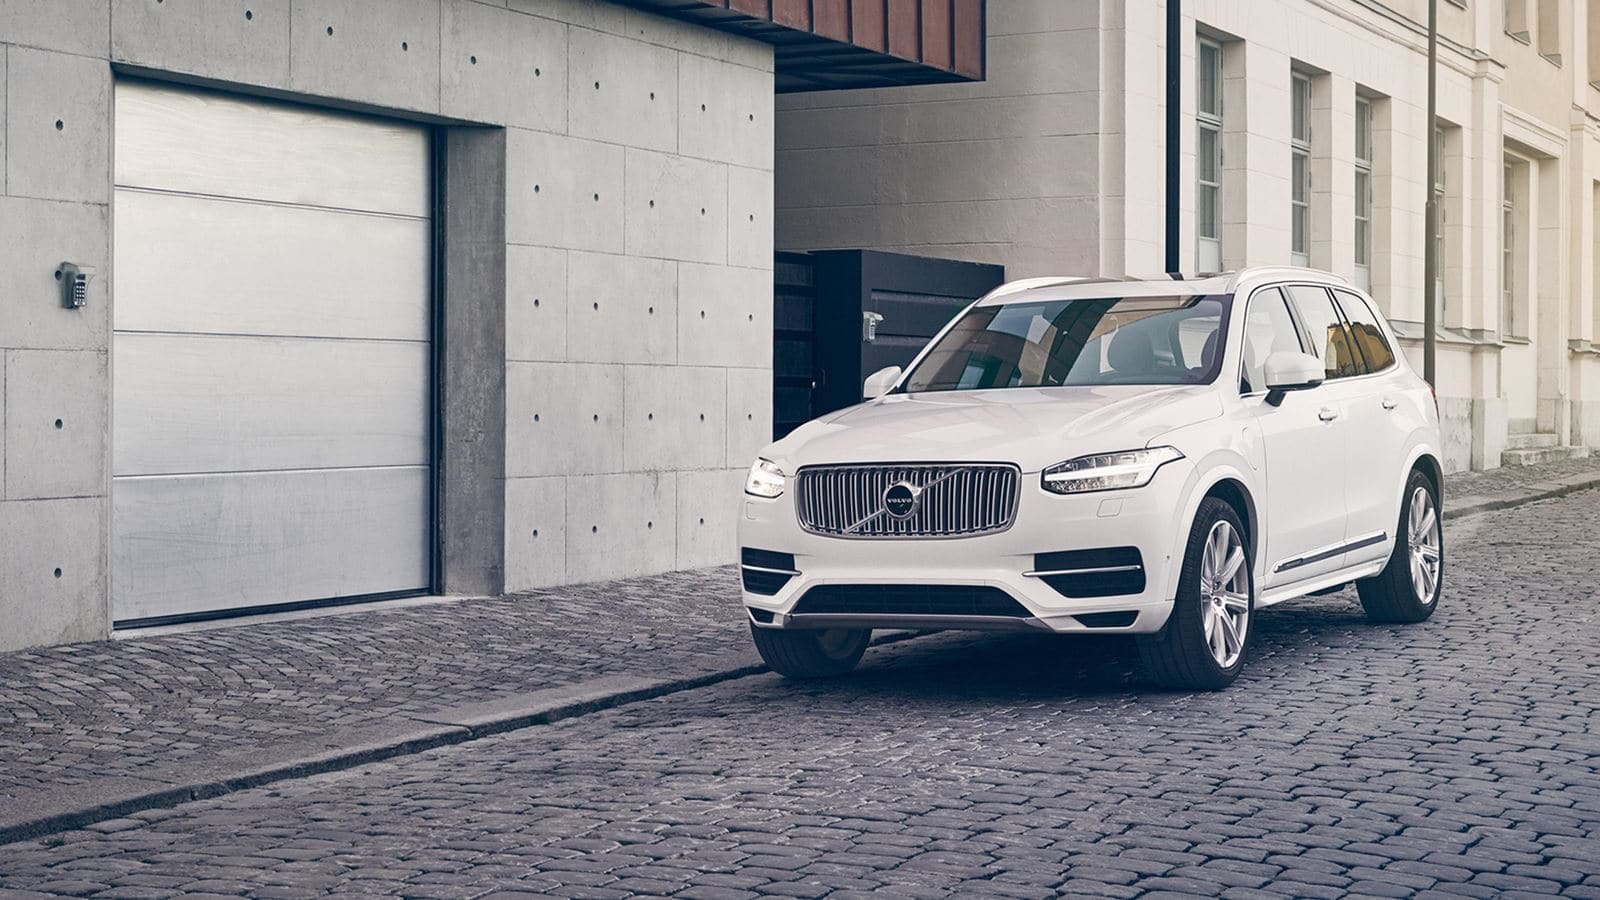 2018 Volvo XC90 Front White Exterior